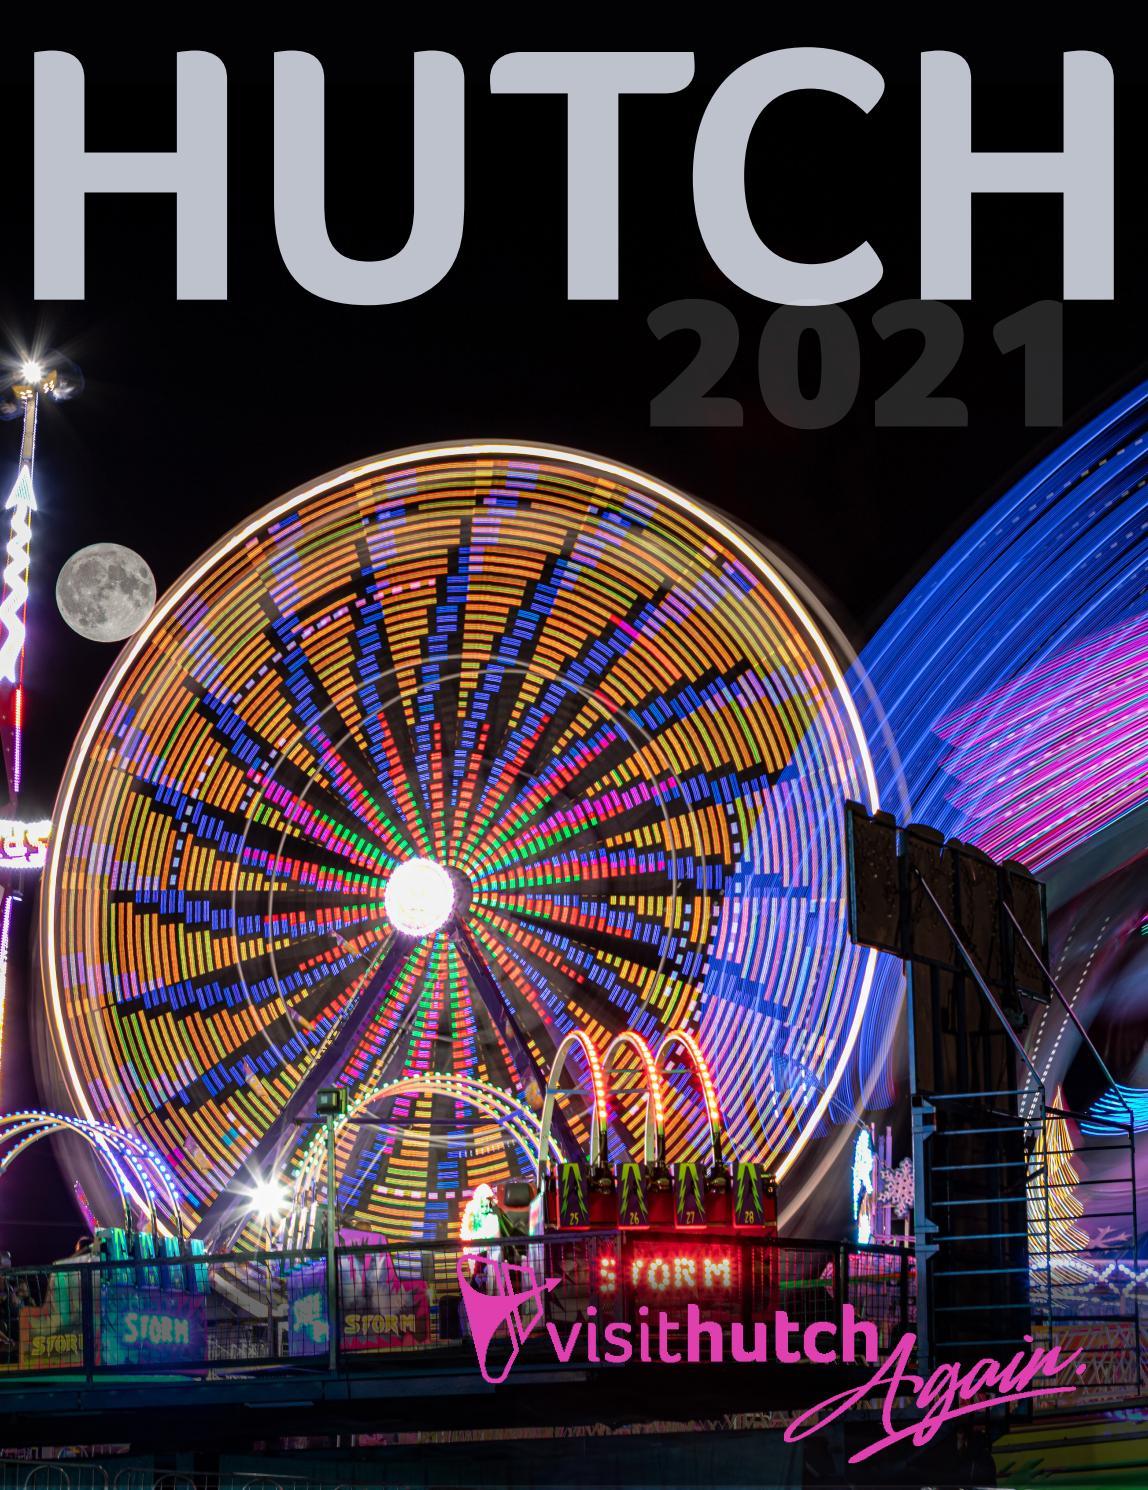 Christmas Parade 2021 Hutchinson Ks 2021 Hutchinson Reno County Visitor Guide By Visit Hutch Issuu